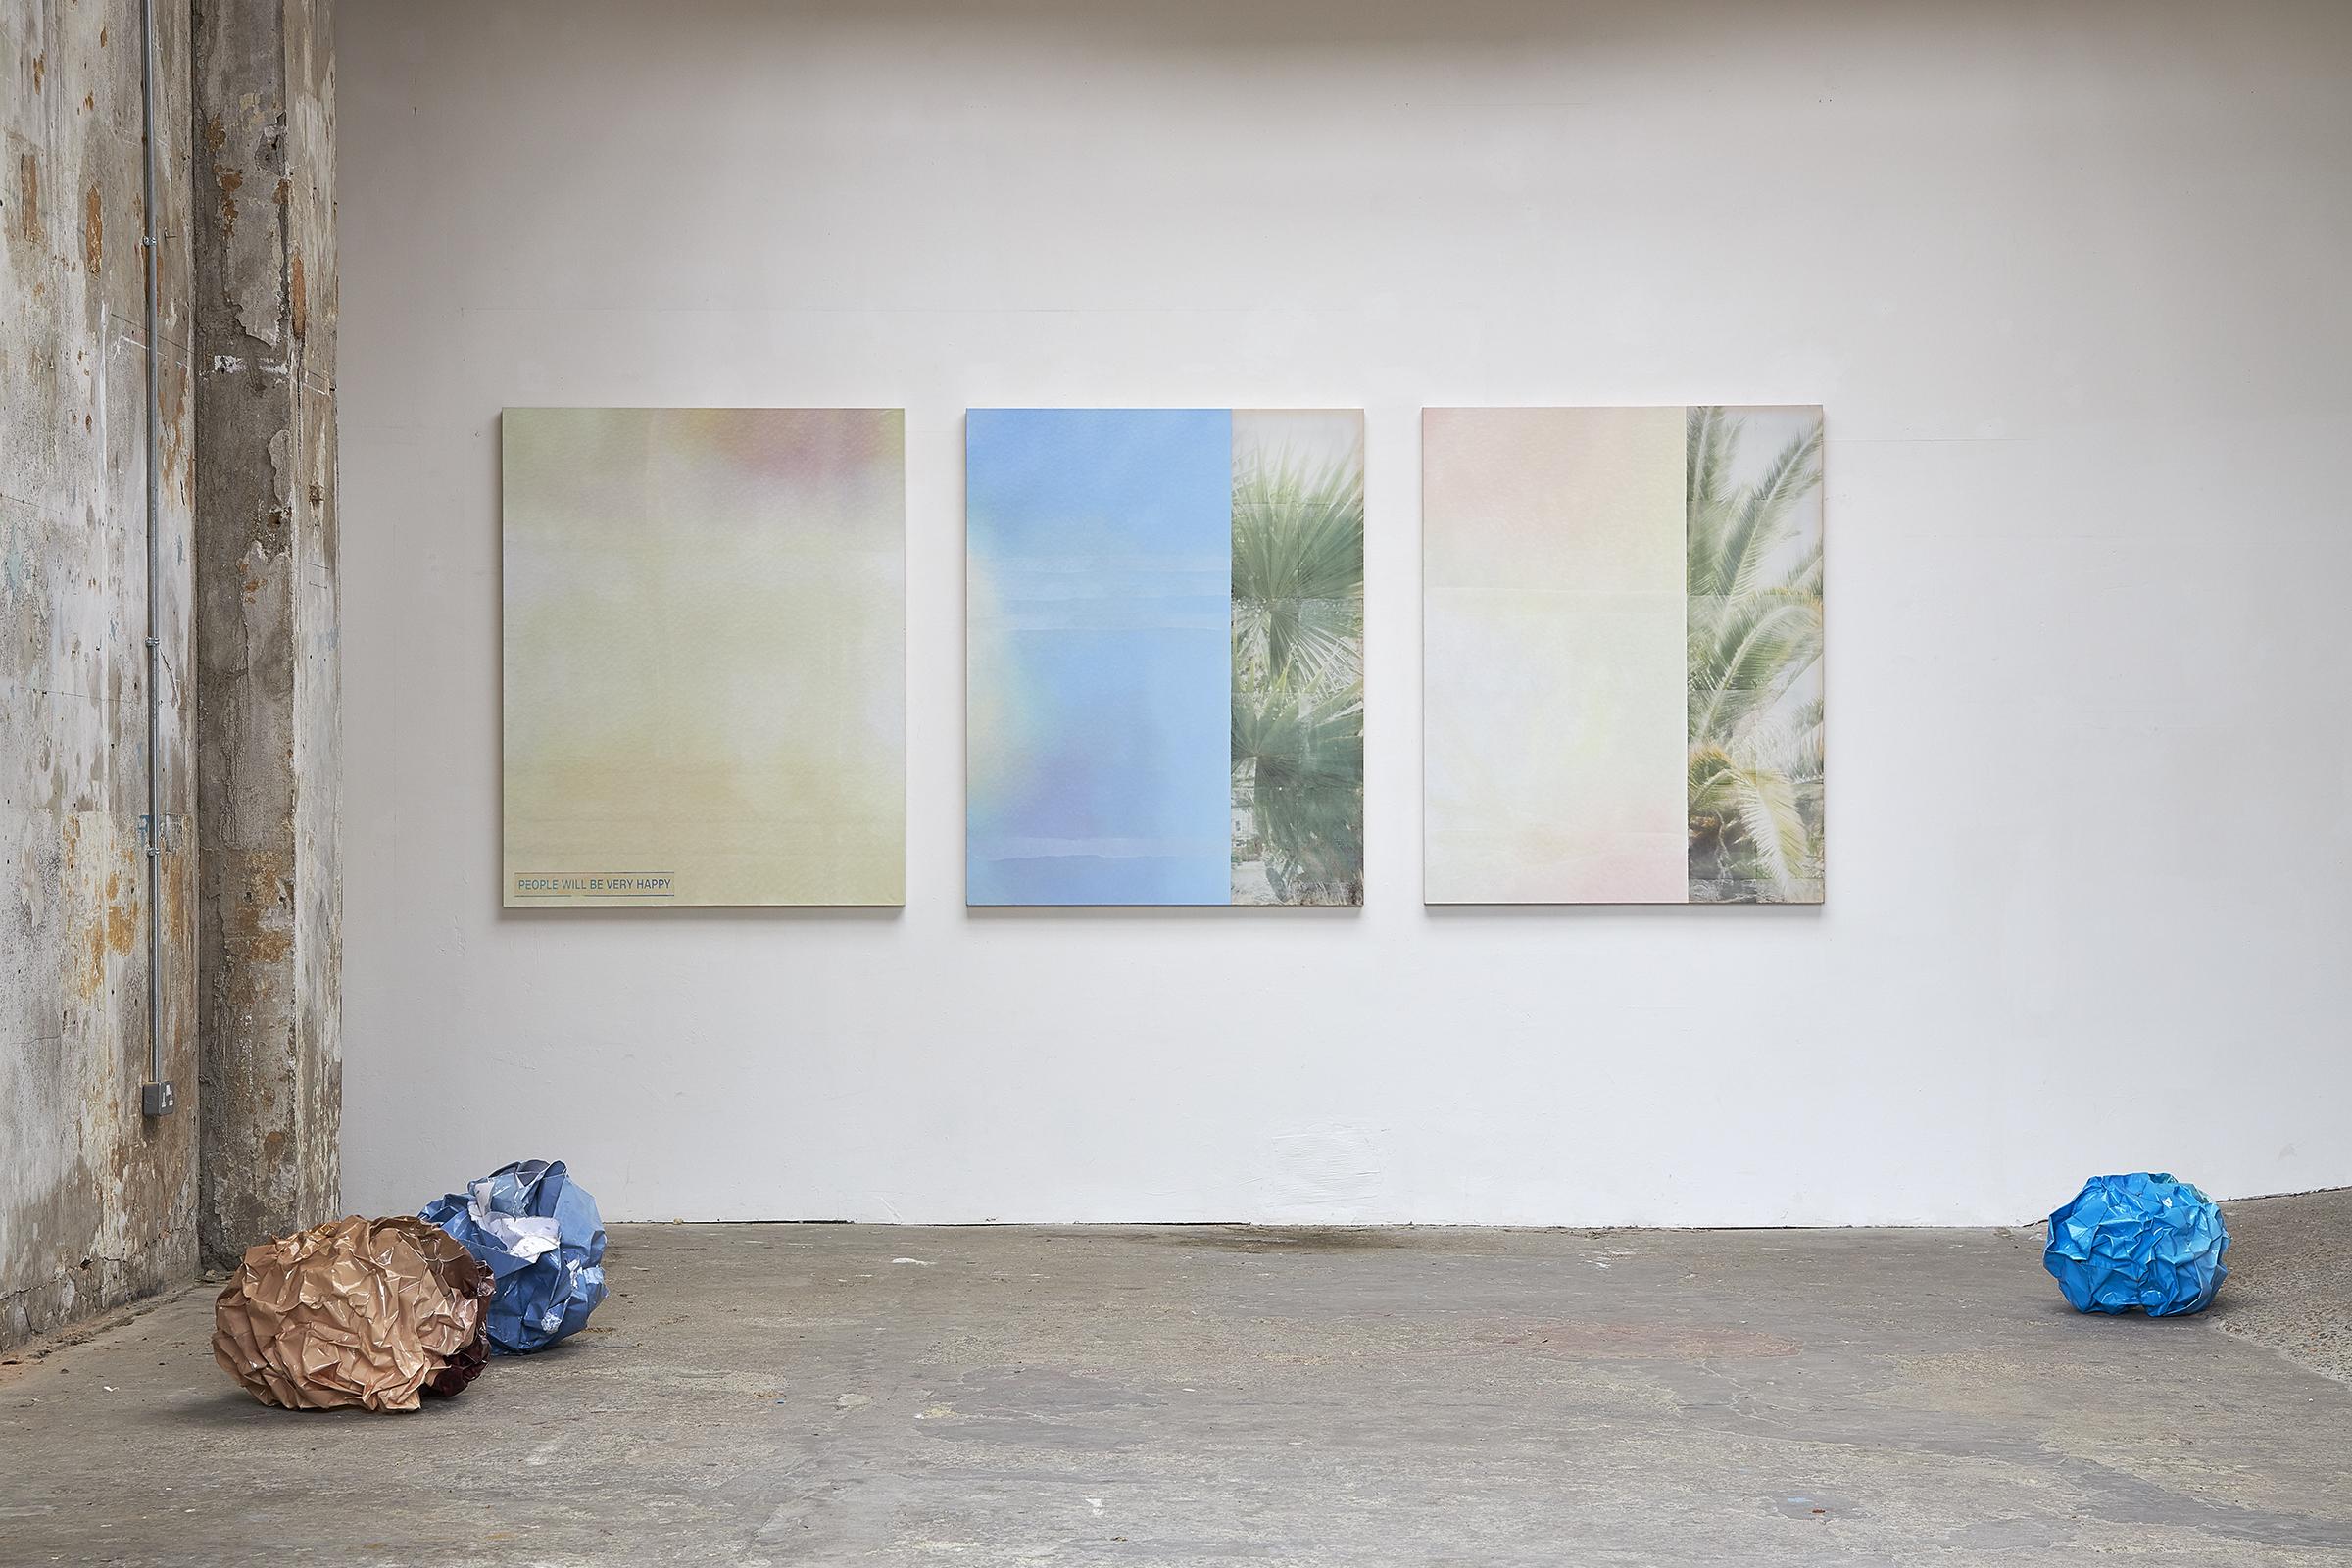 MARTINE POPPE : ARTIST ROOMS : 2019